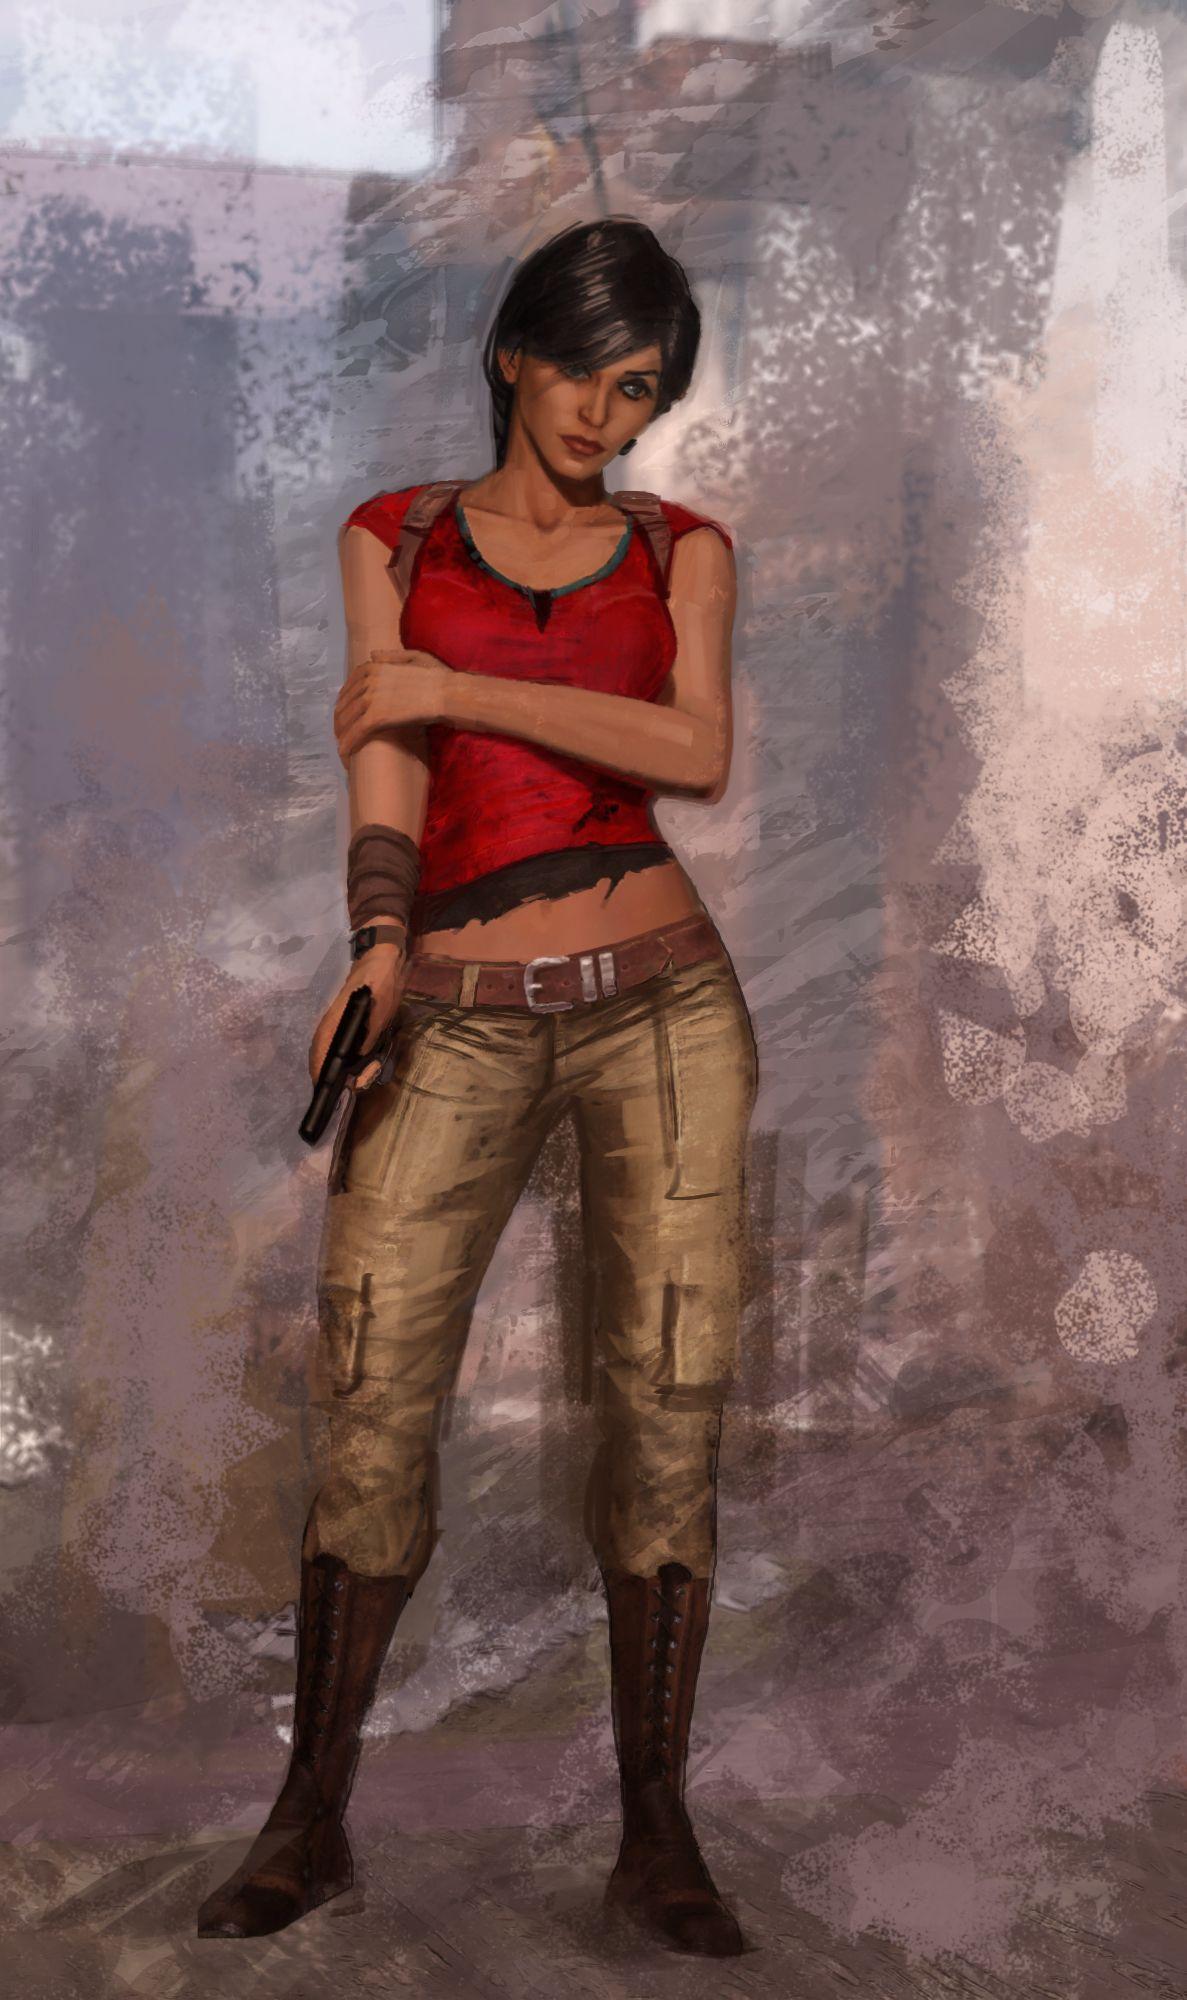 Chloe Frazer - Uncharted | Games | Pinterest | Chloe, Wallpapers ...